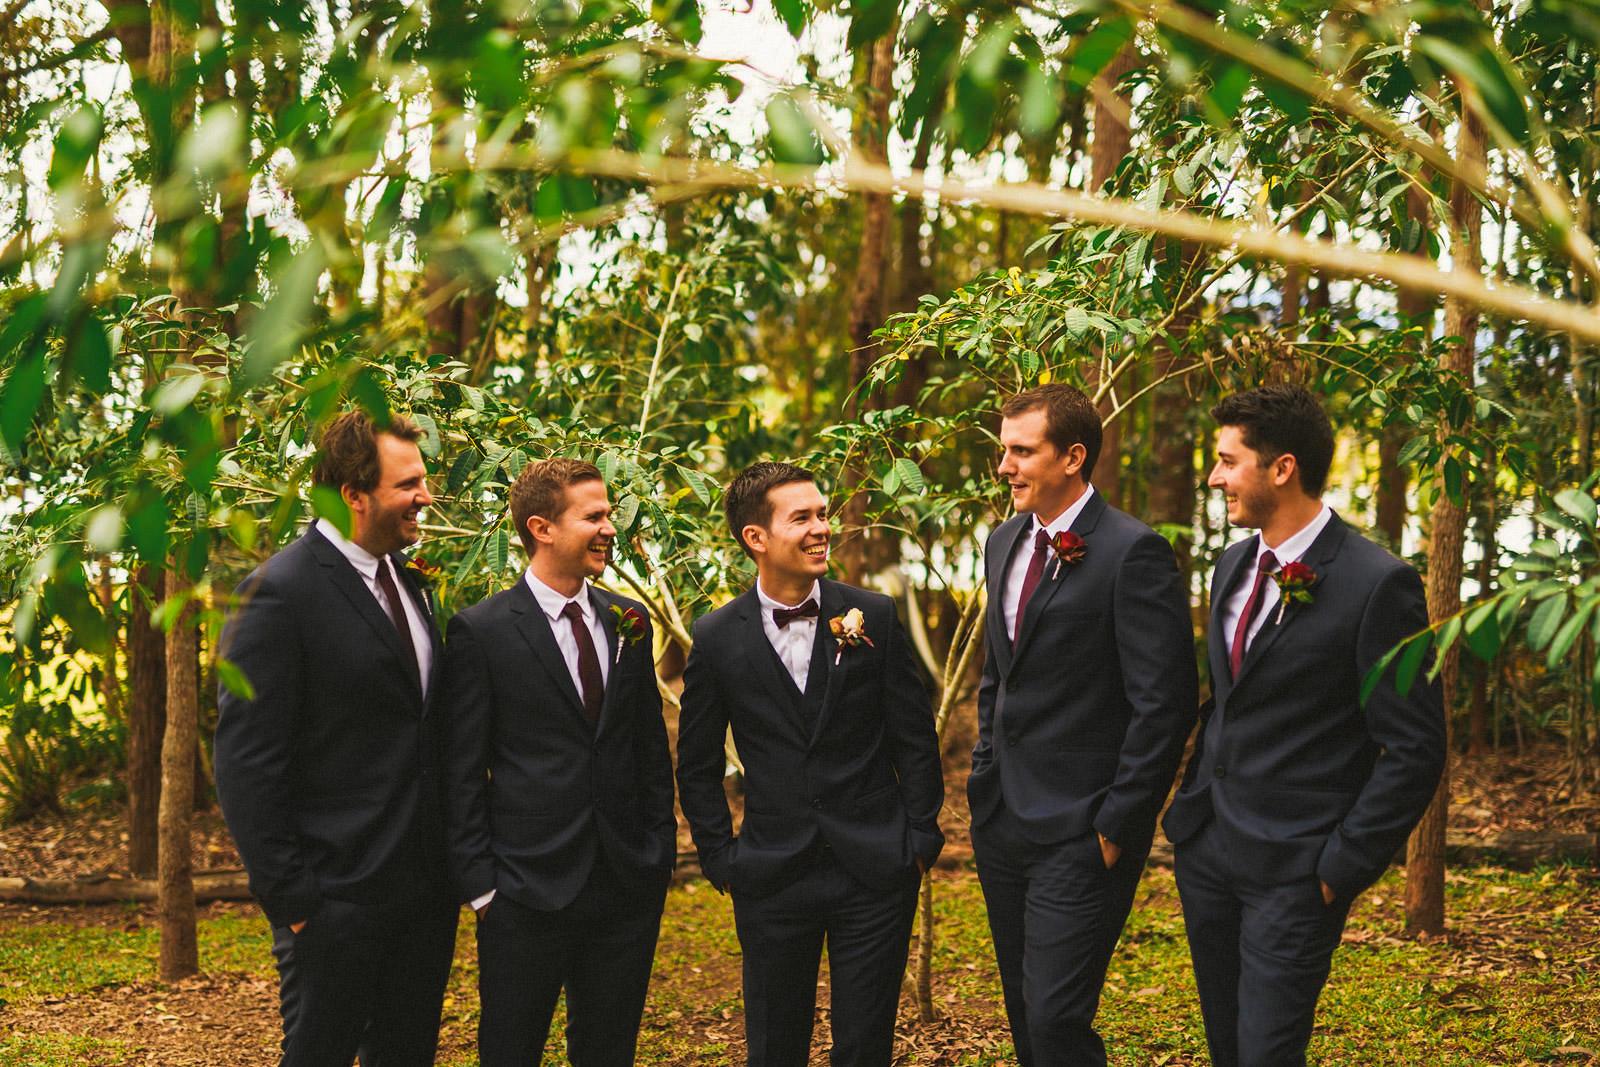 tablelands_wedding_0006